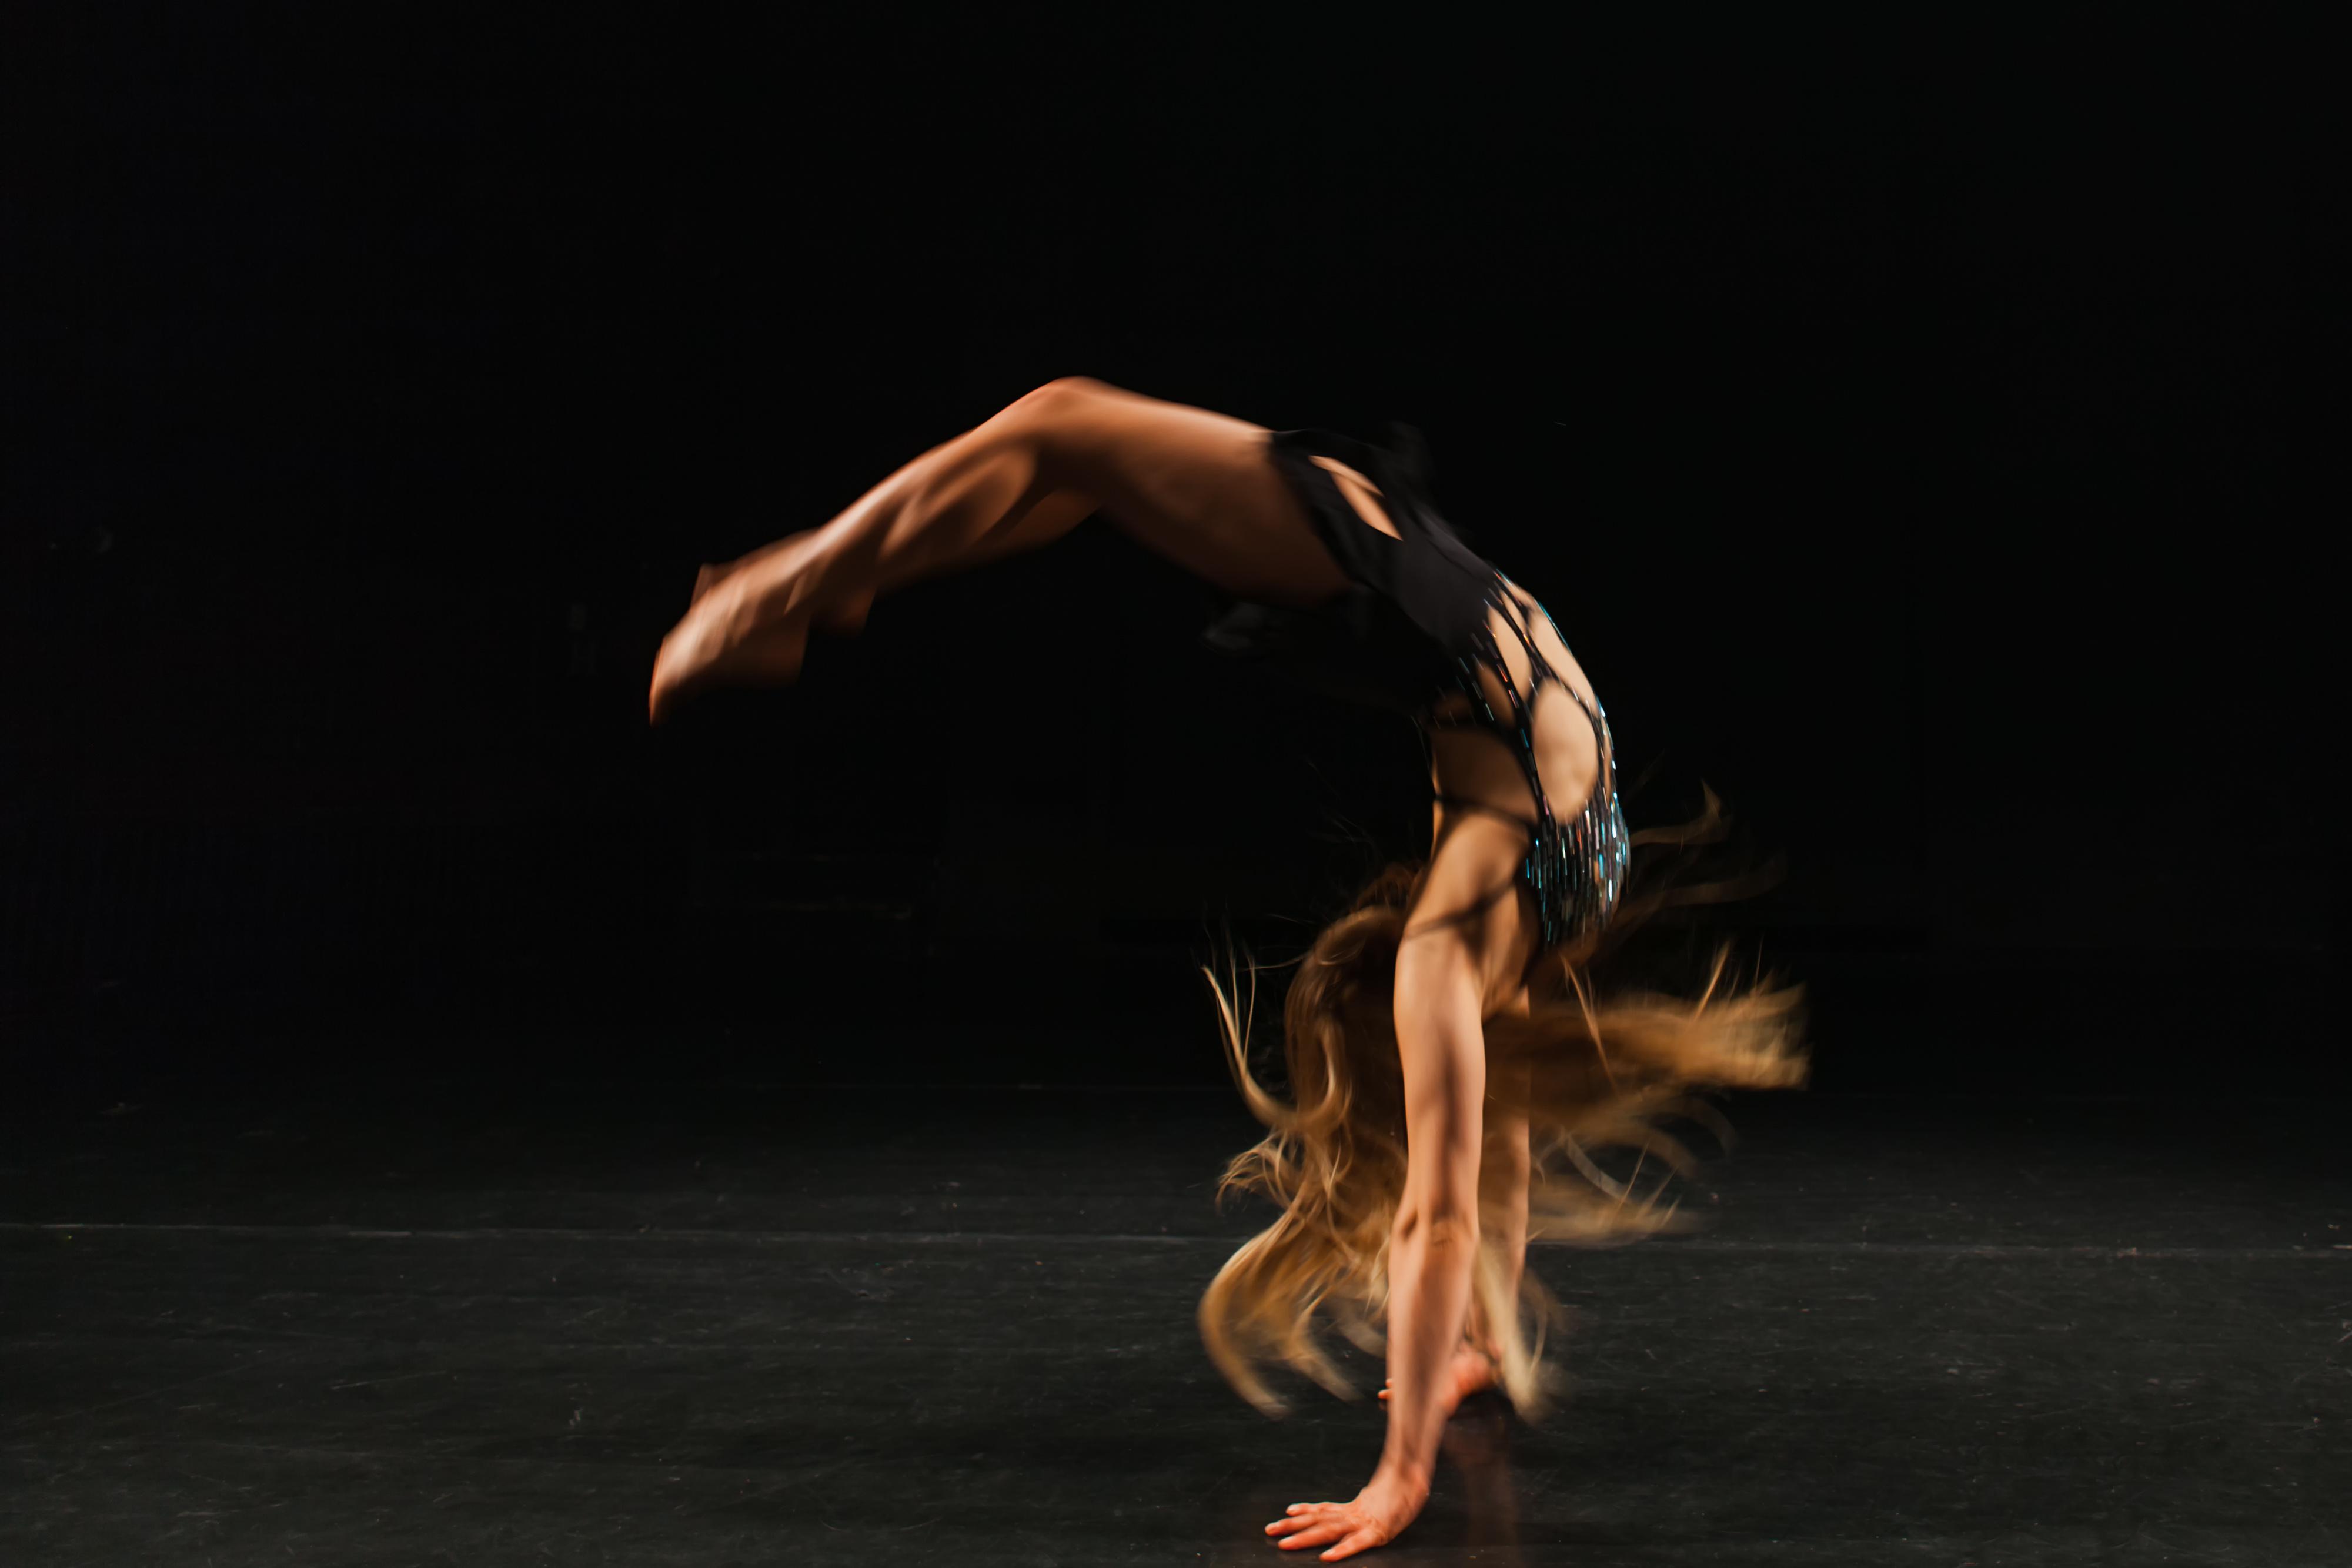 gymnast performing handspring